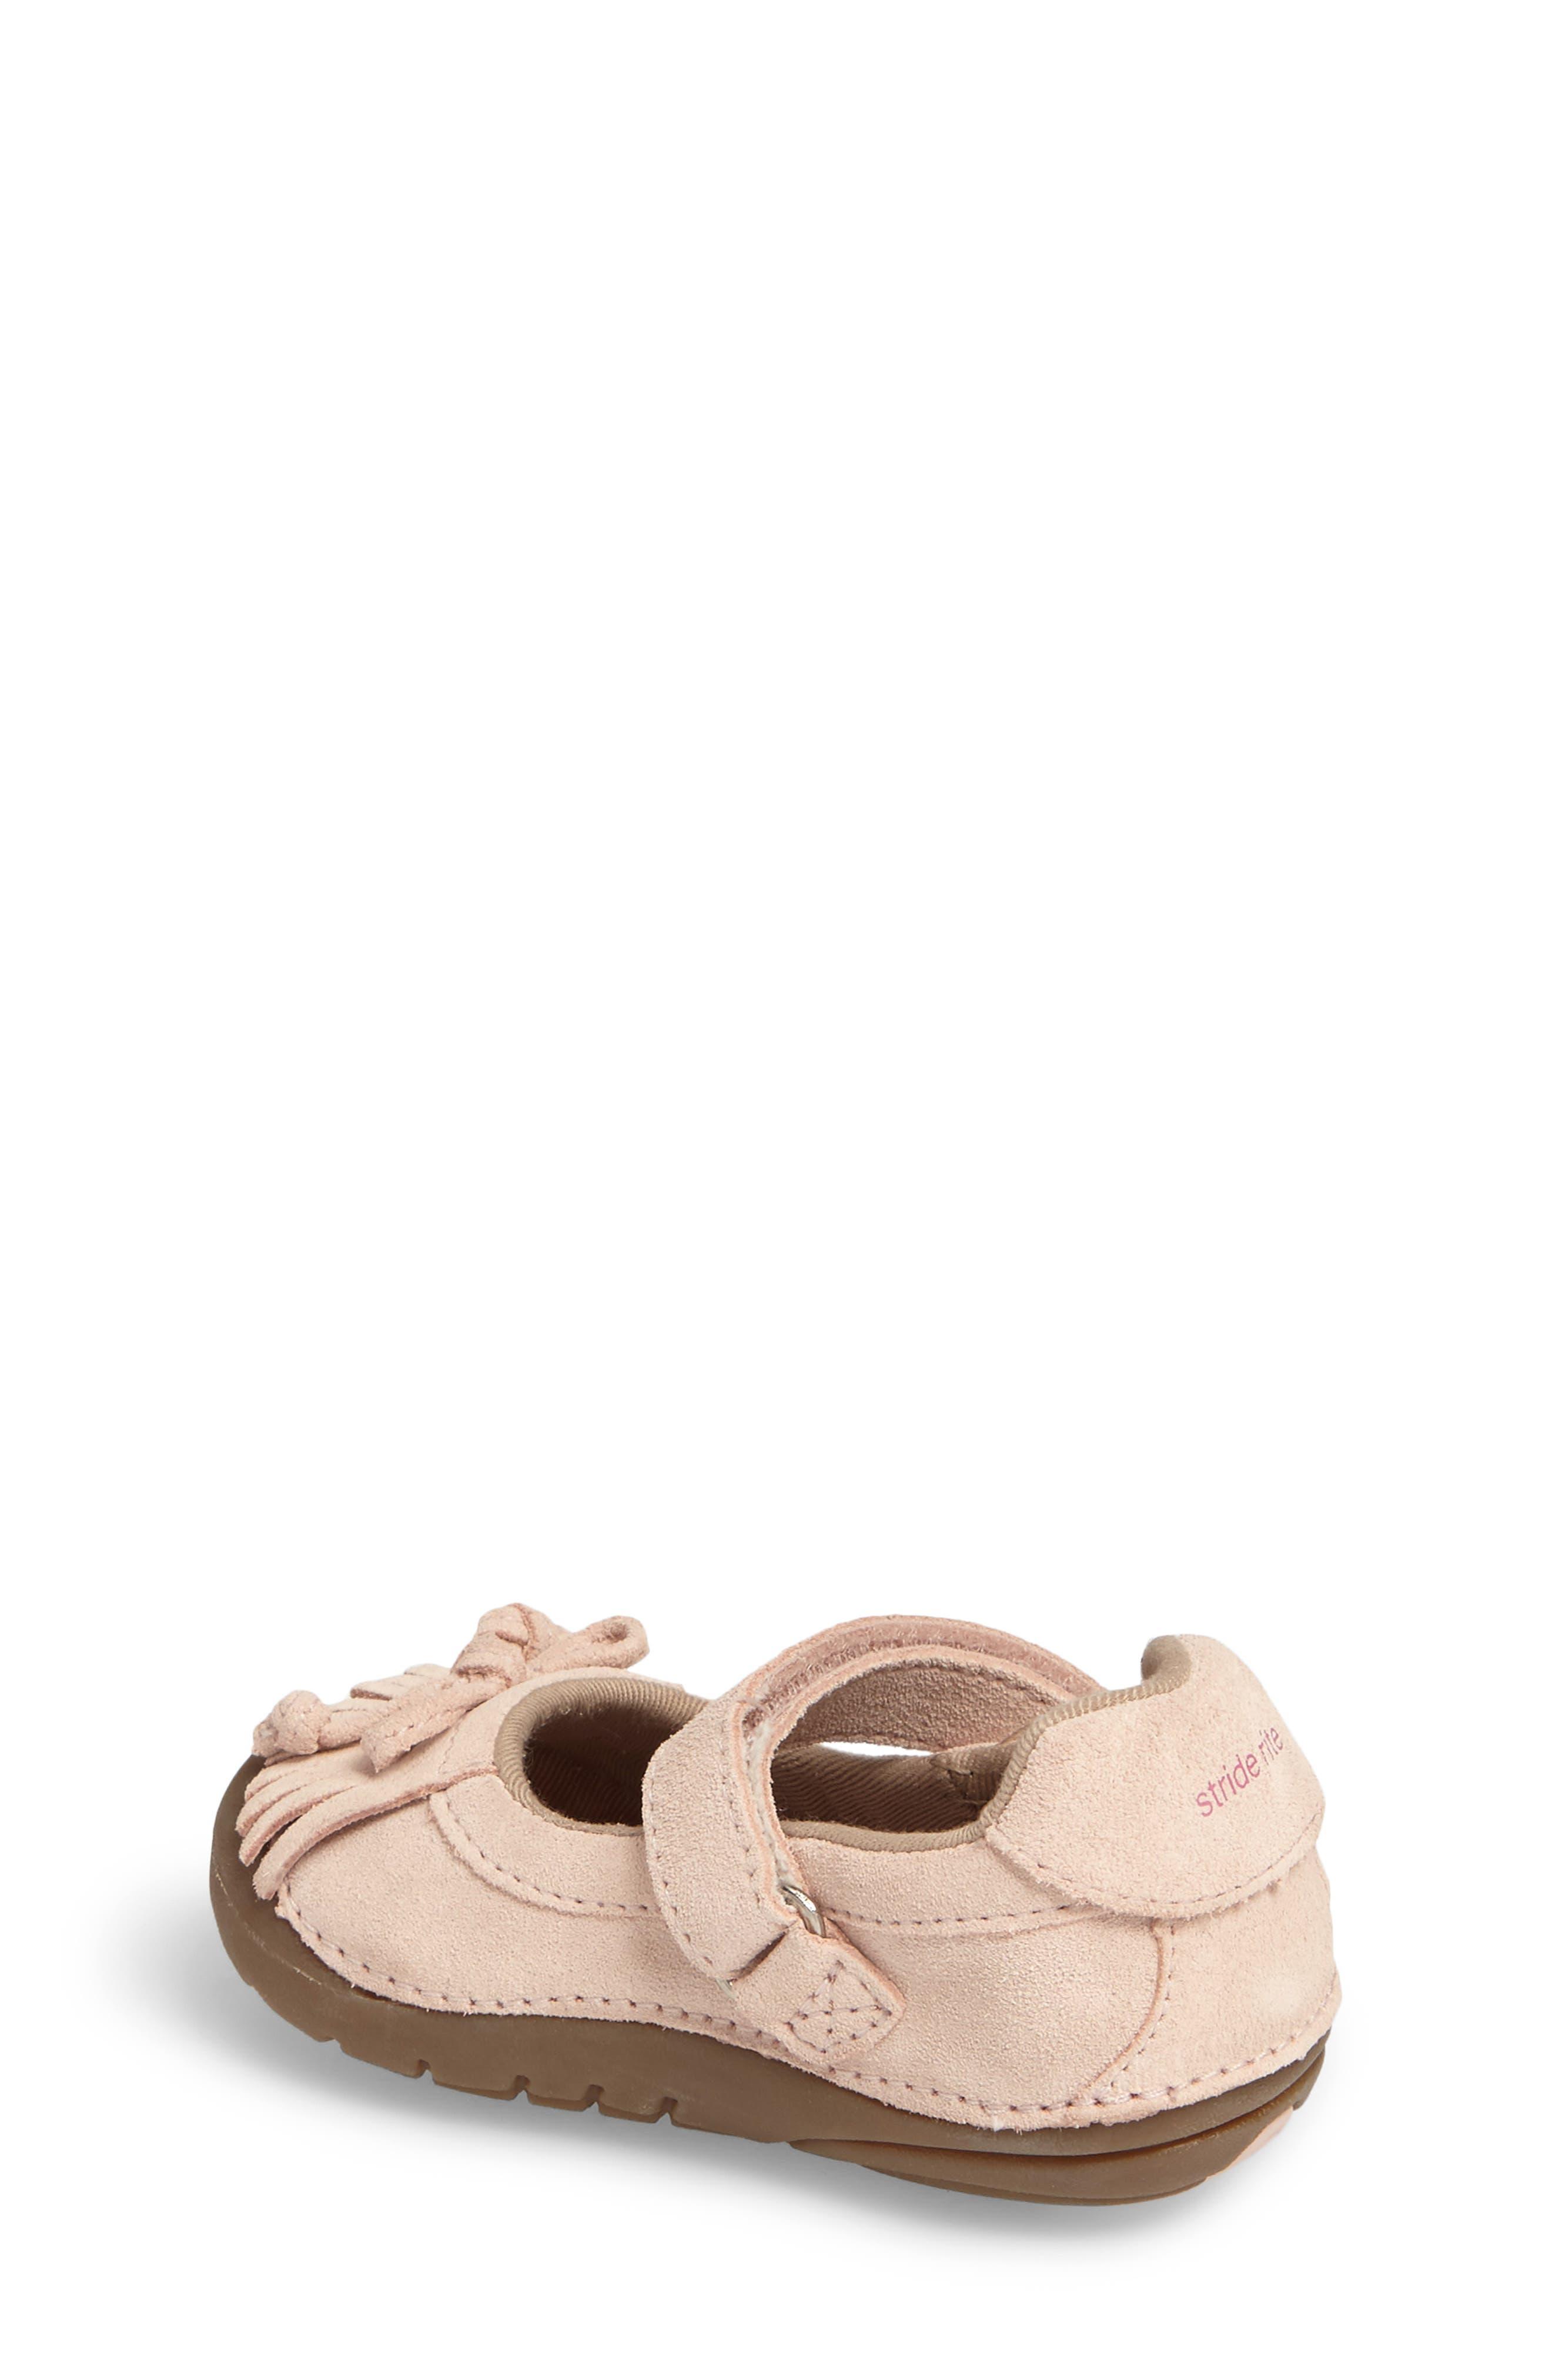 Alternate Image 2  - Stride Rite Soft Motion™ Georgina Mary Jane Flat (Baby & Walker)